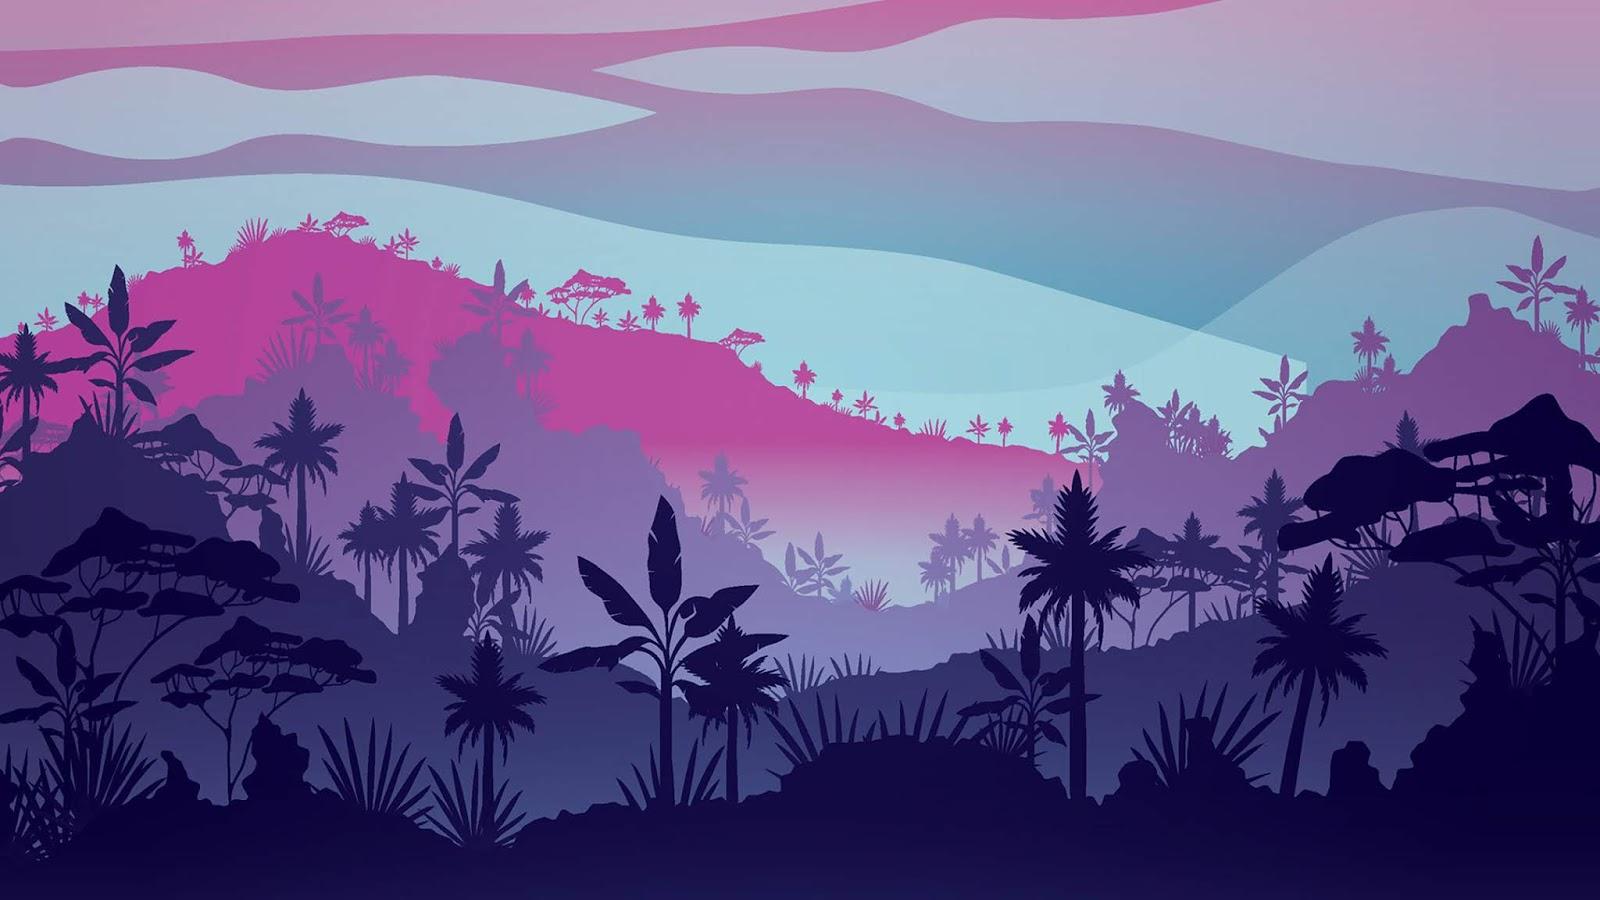 Desktop Wallpaper Hd 2048x1152